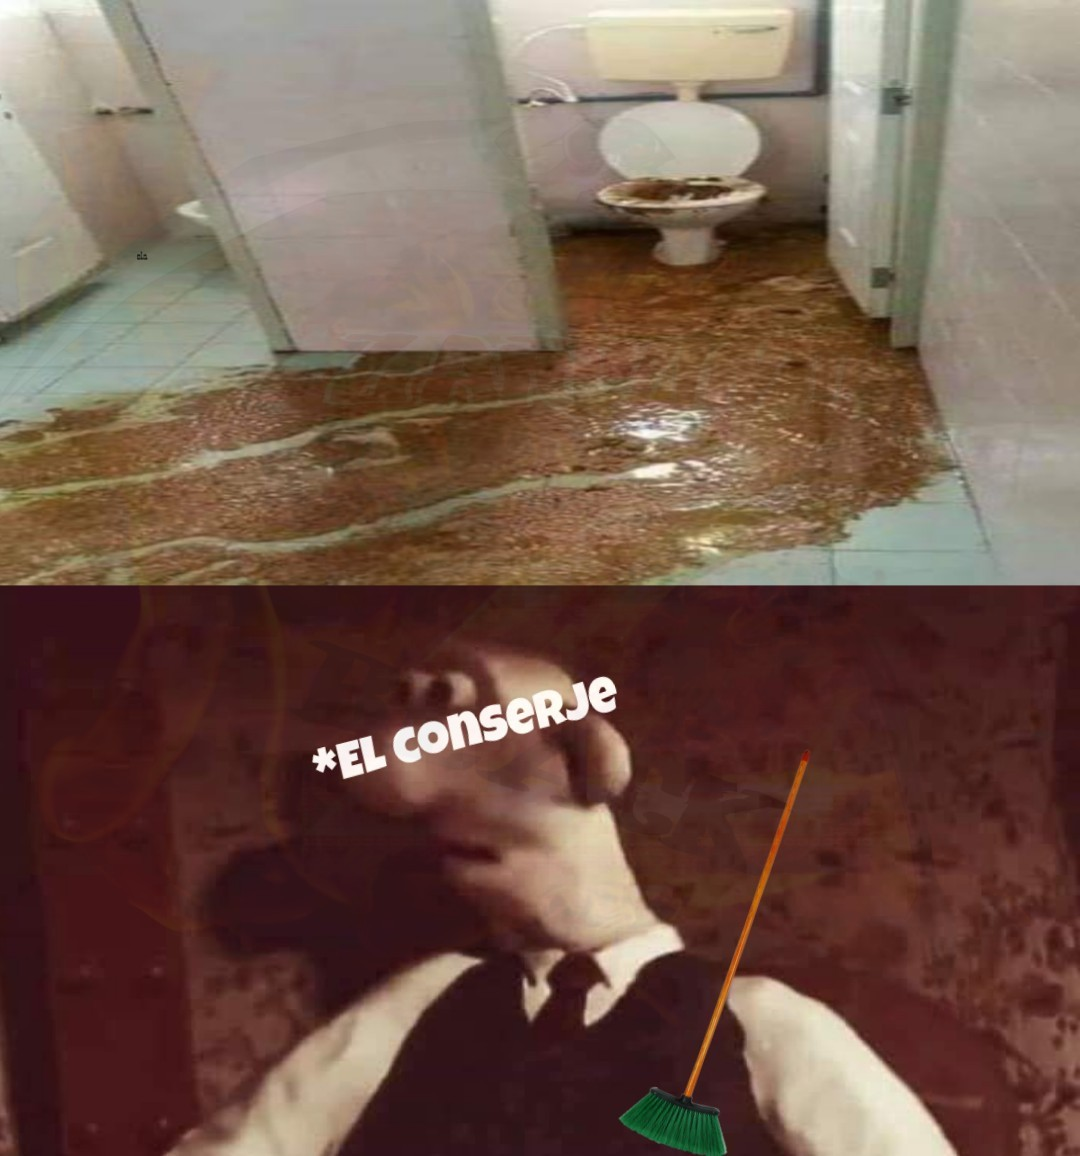 Wacala - meme